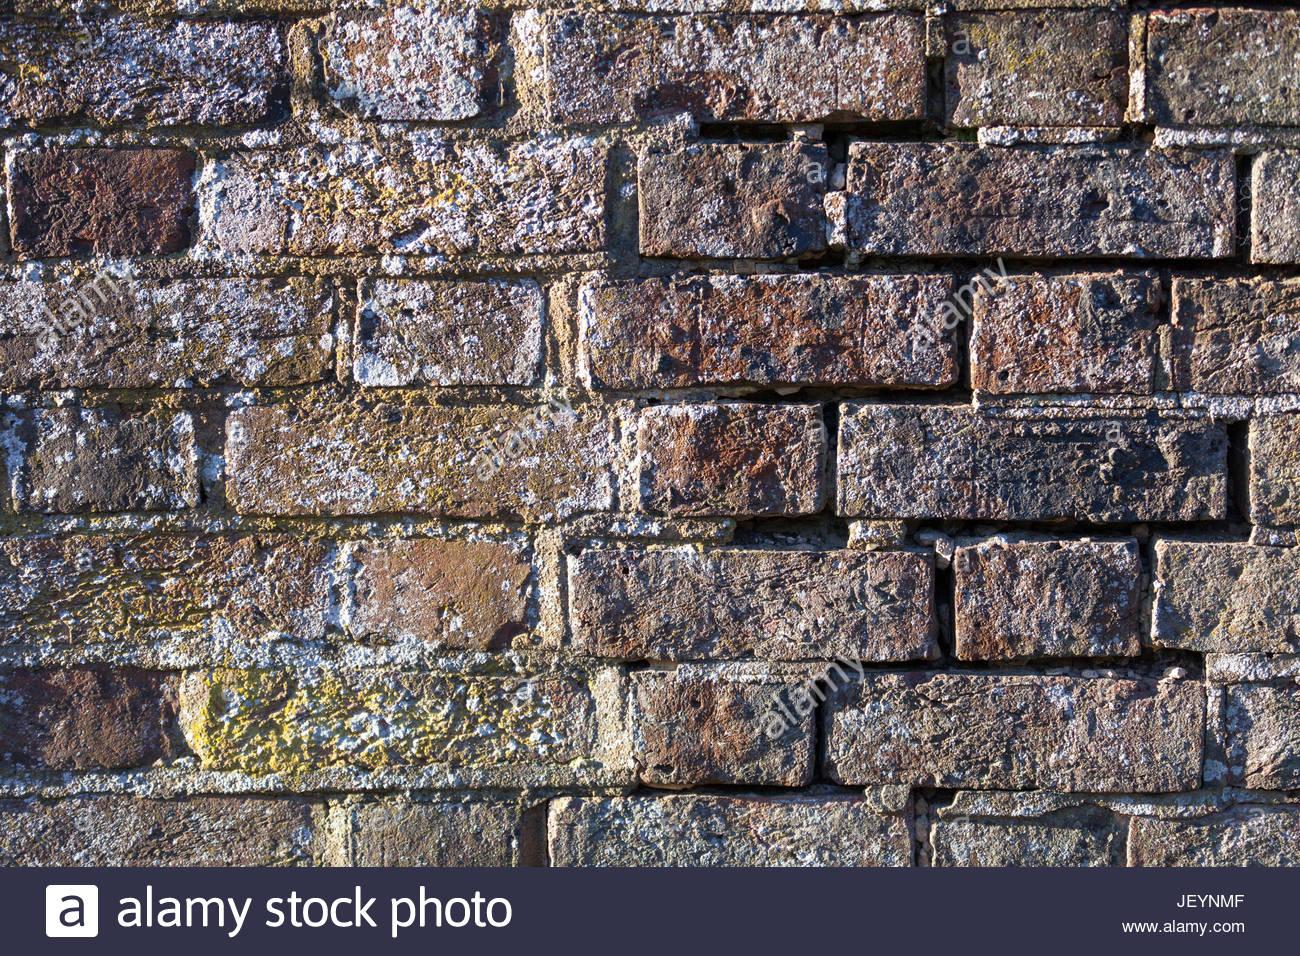 English brickwork in a poor state of disrepair crack algae lichen damp uk Stock Photo